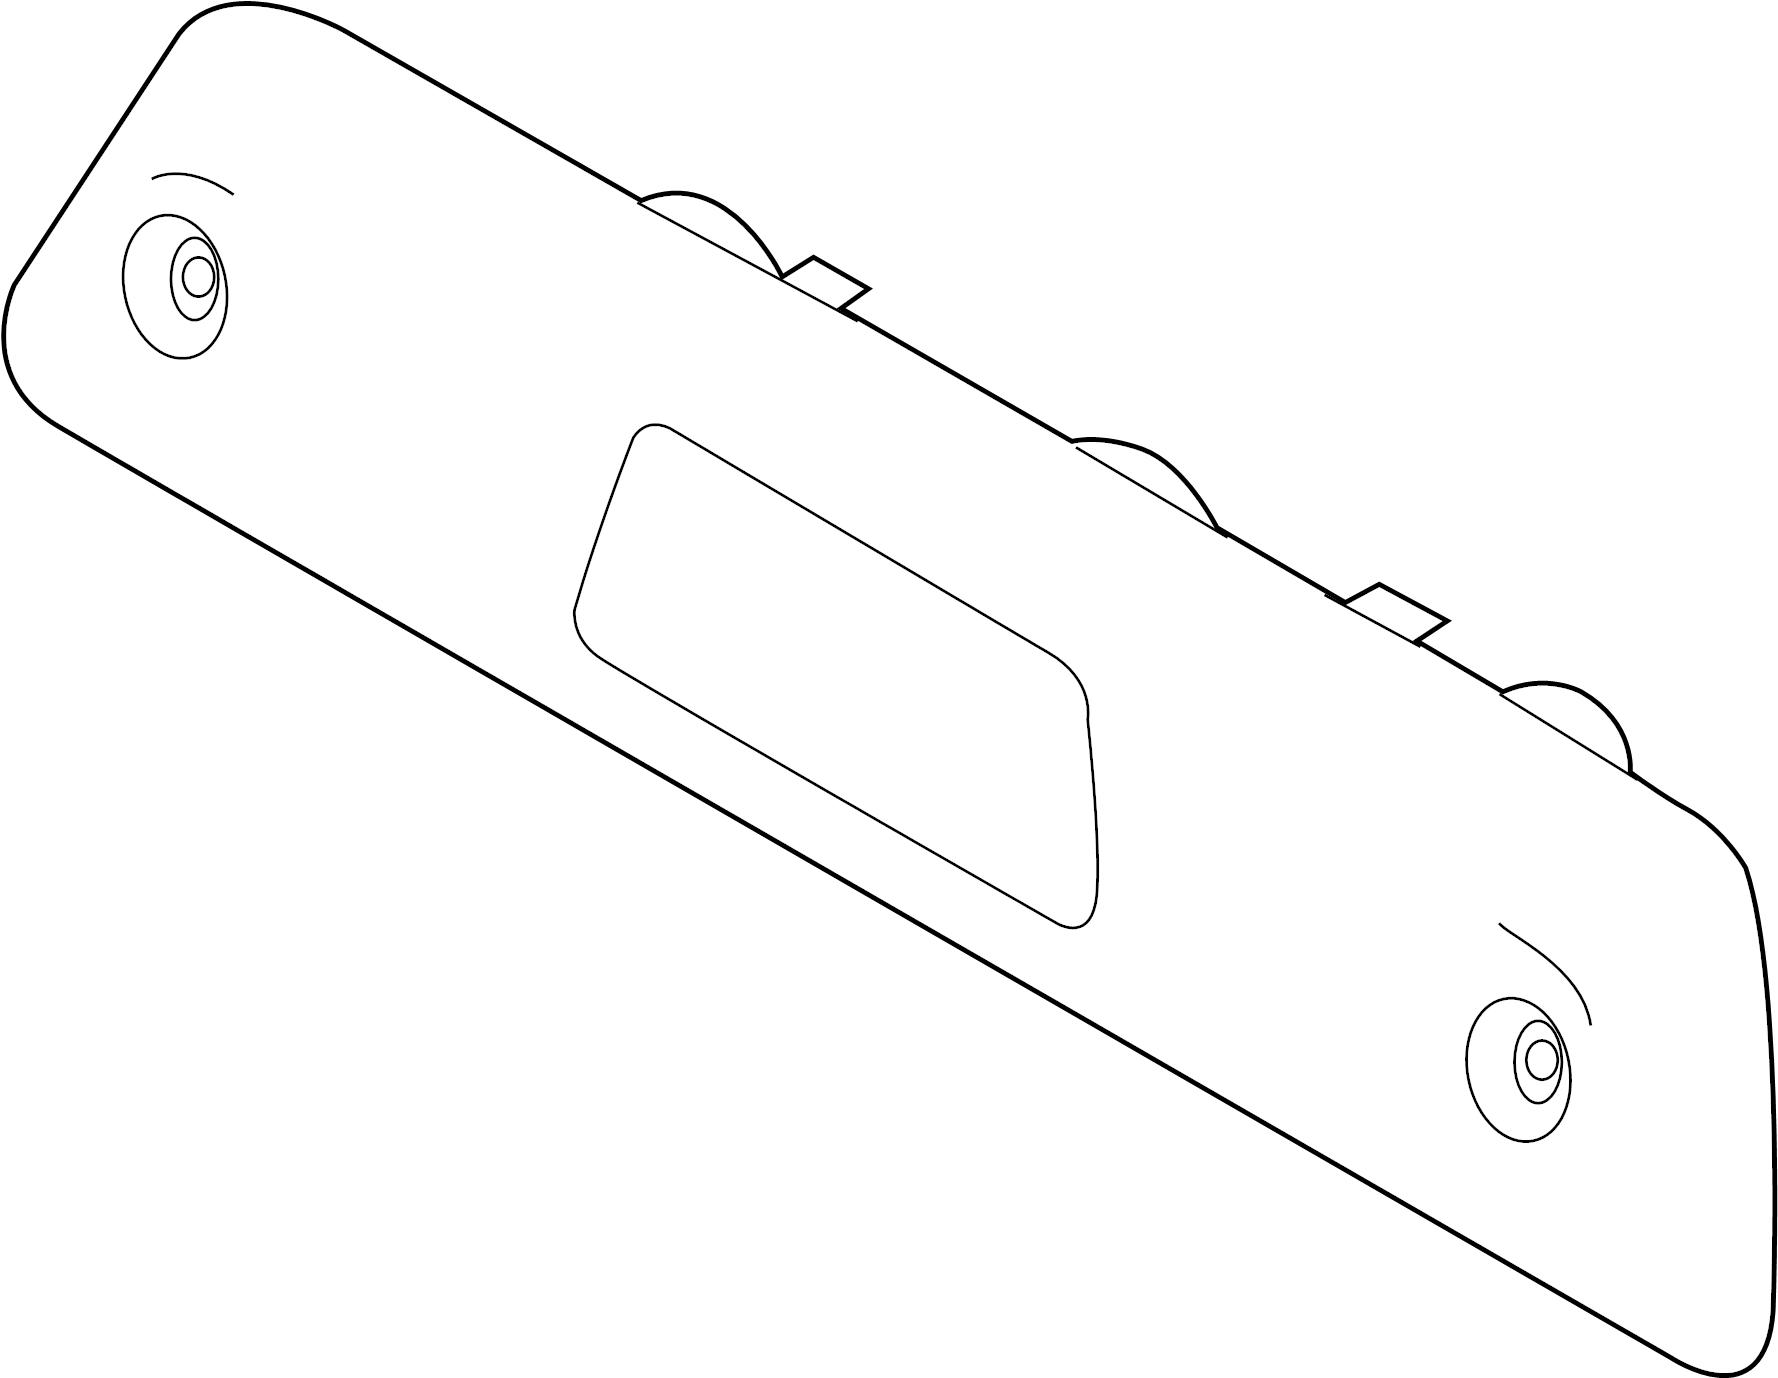 2001 Dodge Ram Overhead Console Wiring Diagram 2006 Dodge